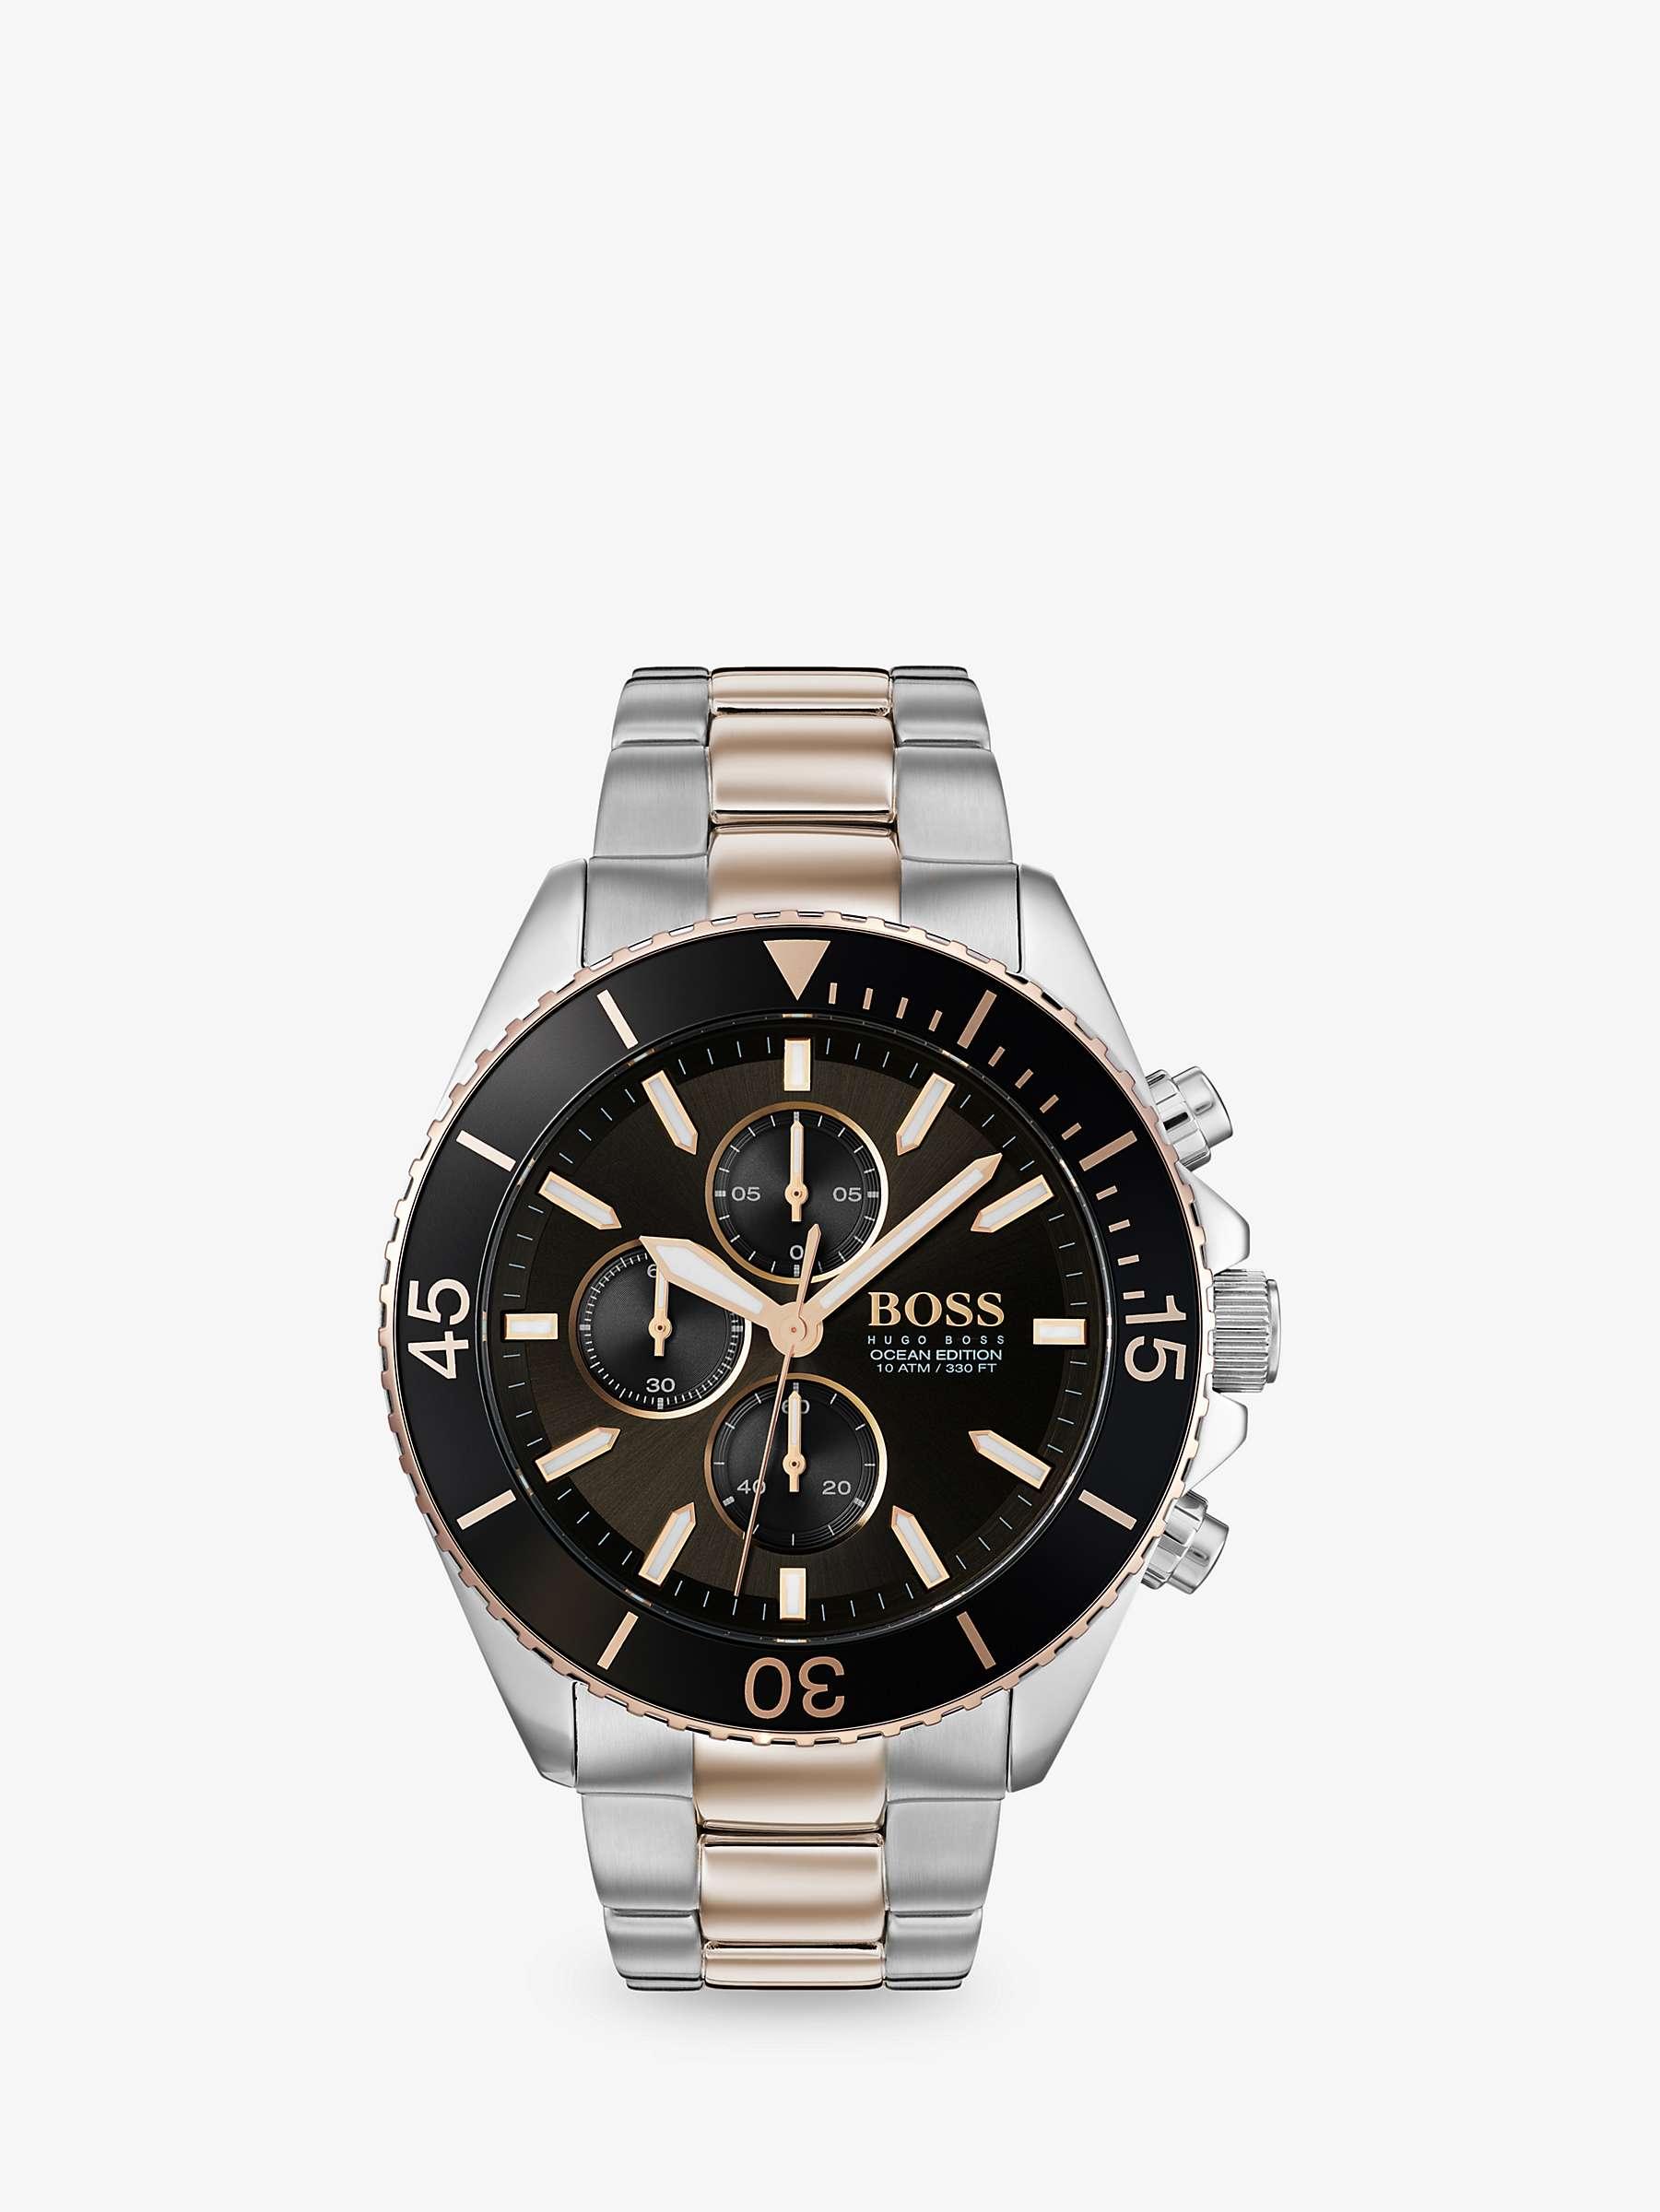 HUGO BOSS Men's Ocean Edition Chronograph Bracelet Strap Watch, Silver/Gold £134.50 John Lewis & Partners